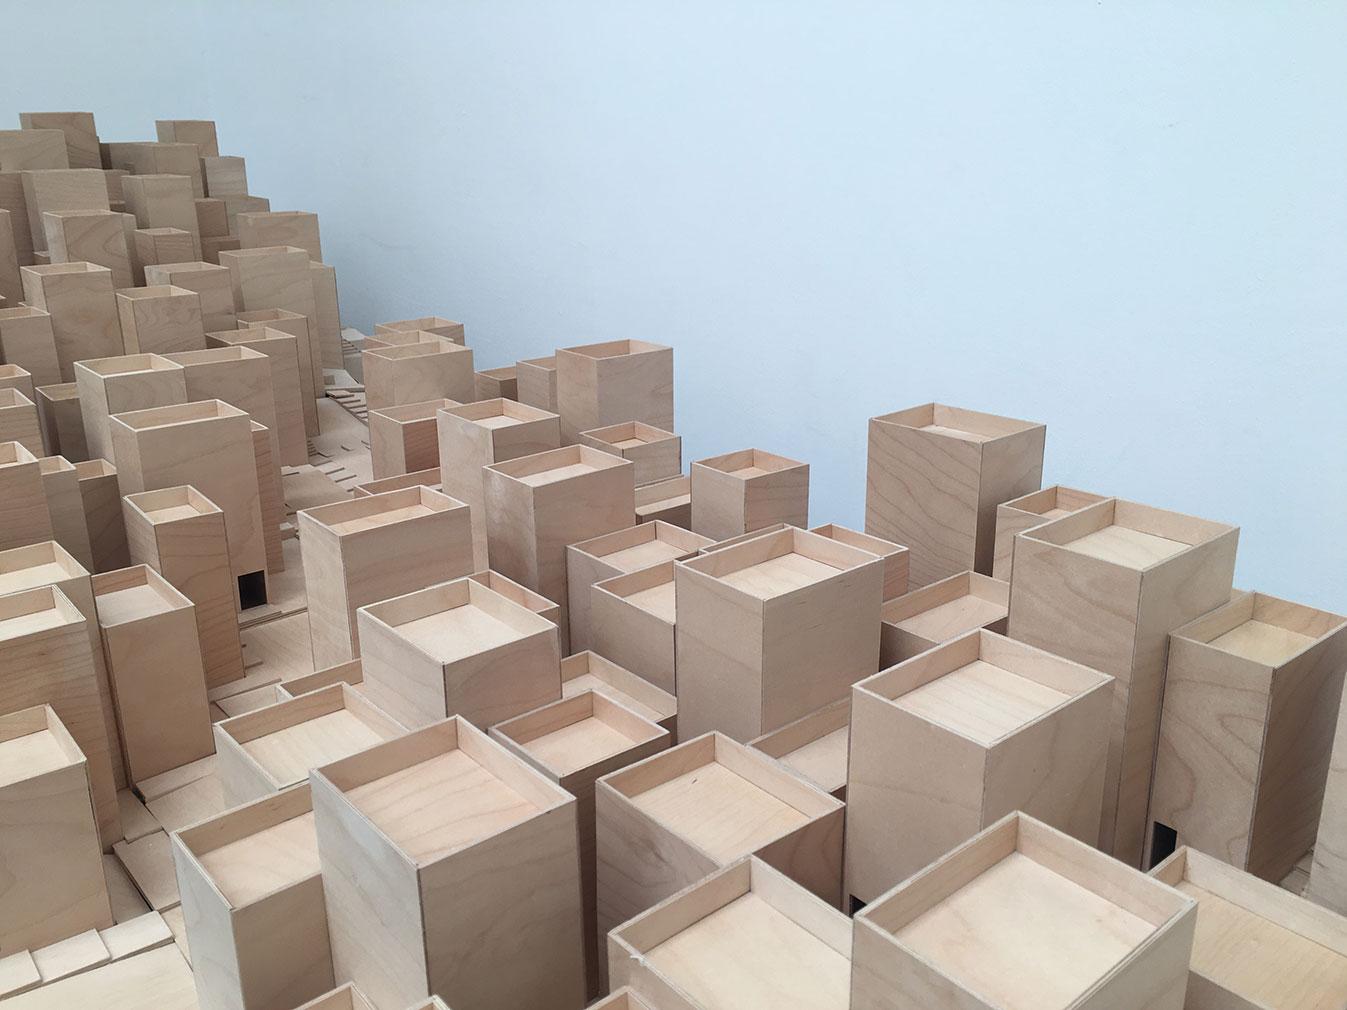 Christian Kerez's installation at the Giardini's Central Pavilion